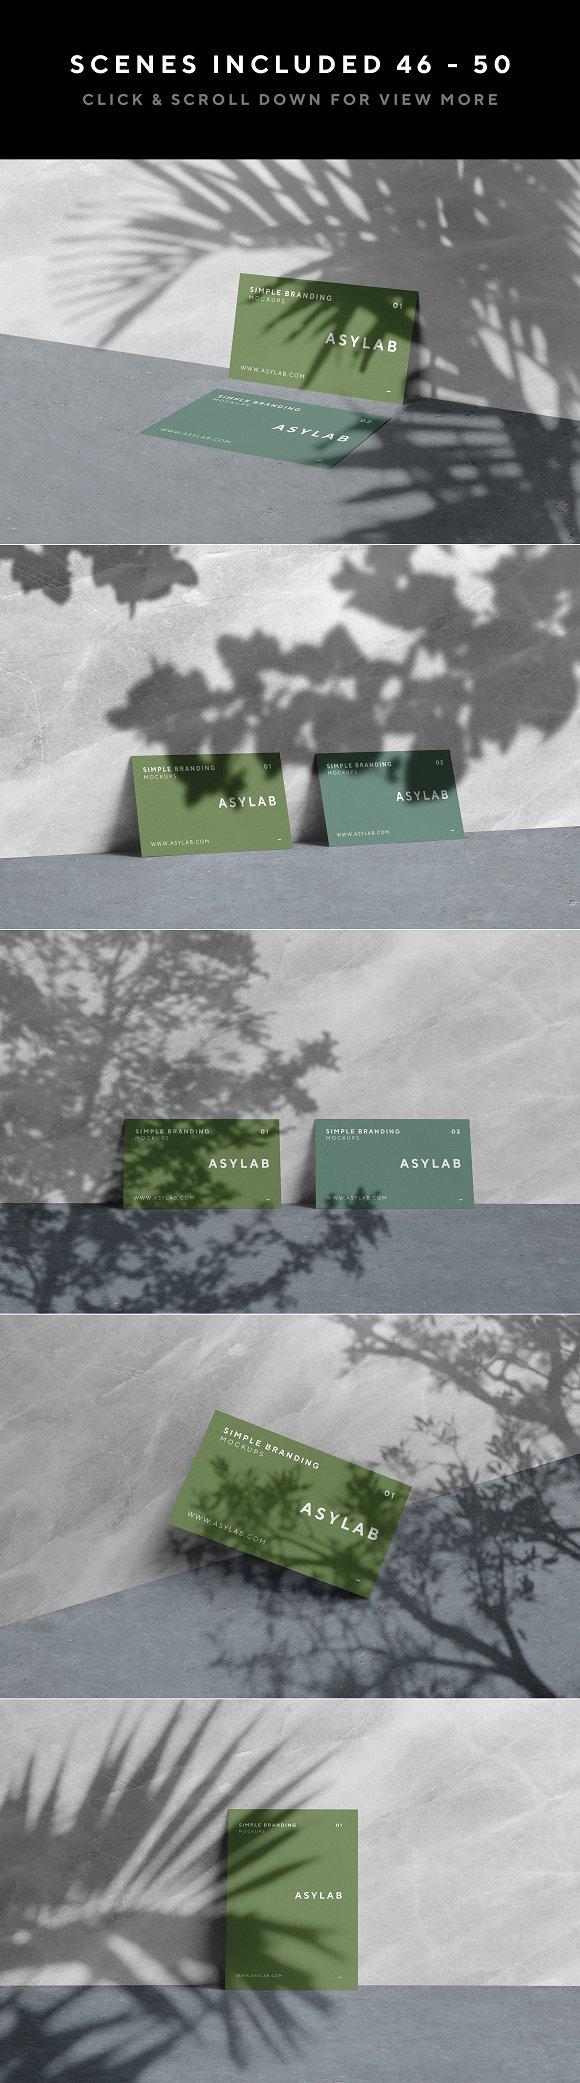 100 Branding Stationery Mockups in Branding Mockups - product preview 24